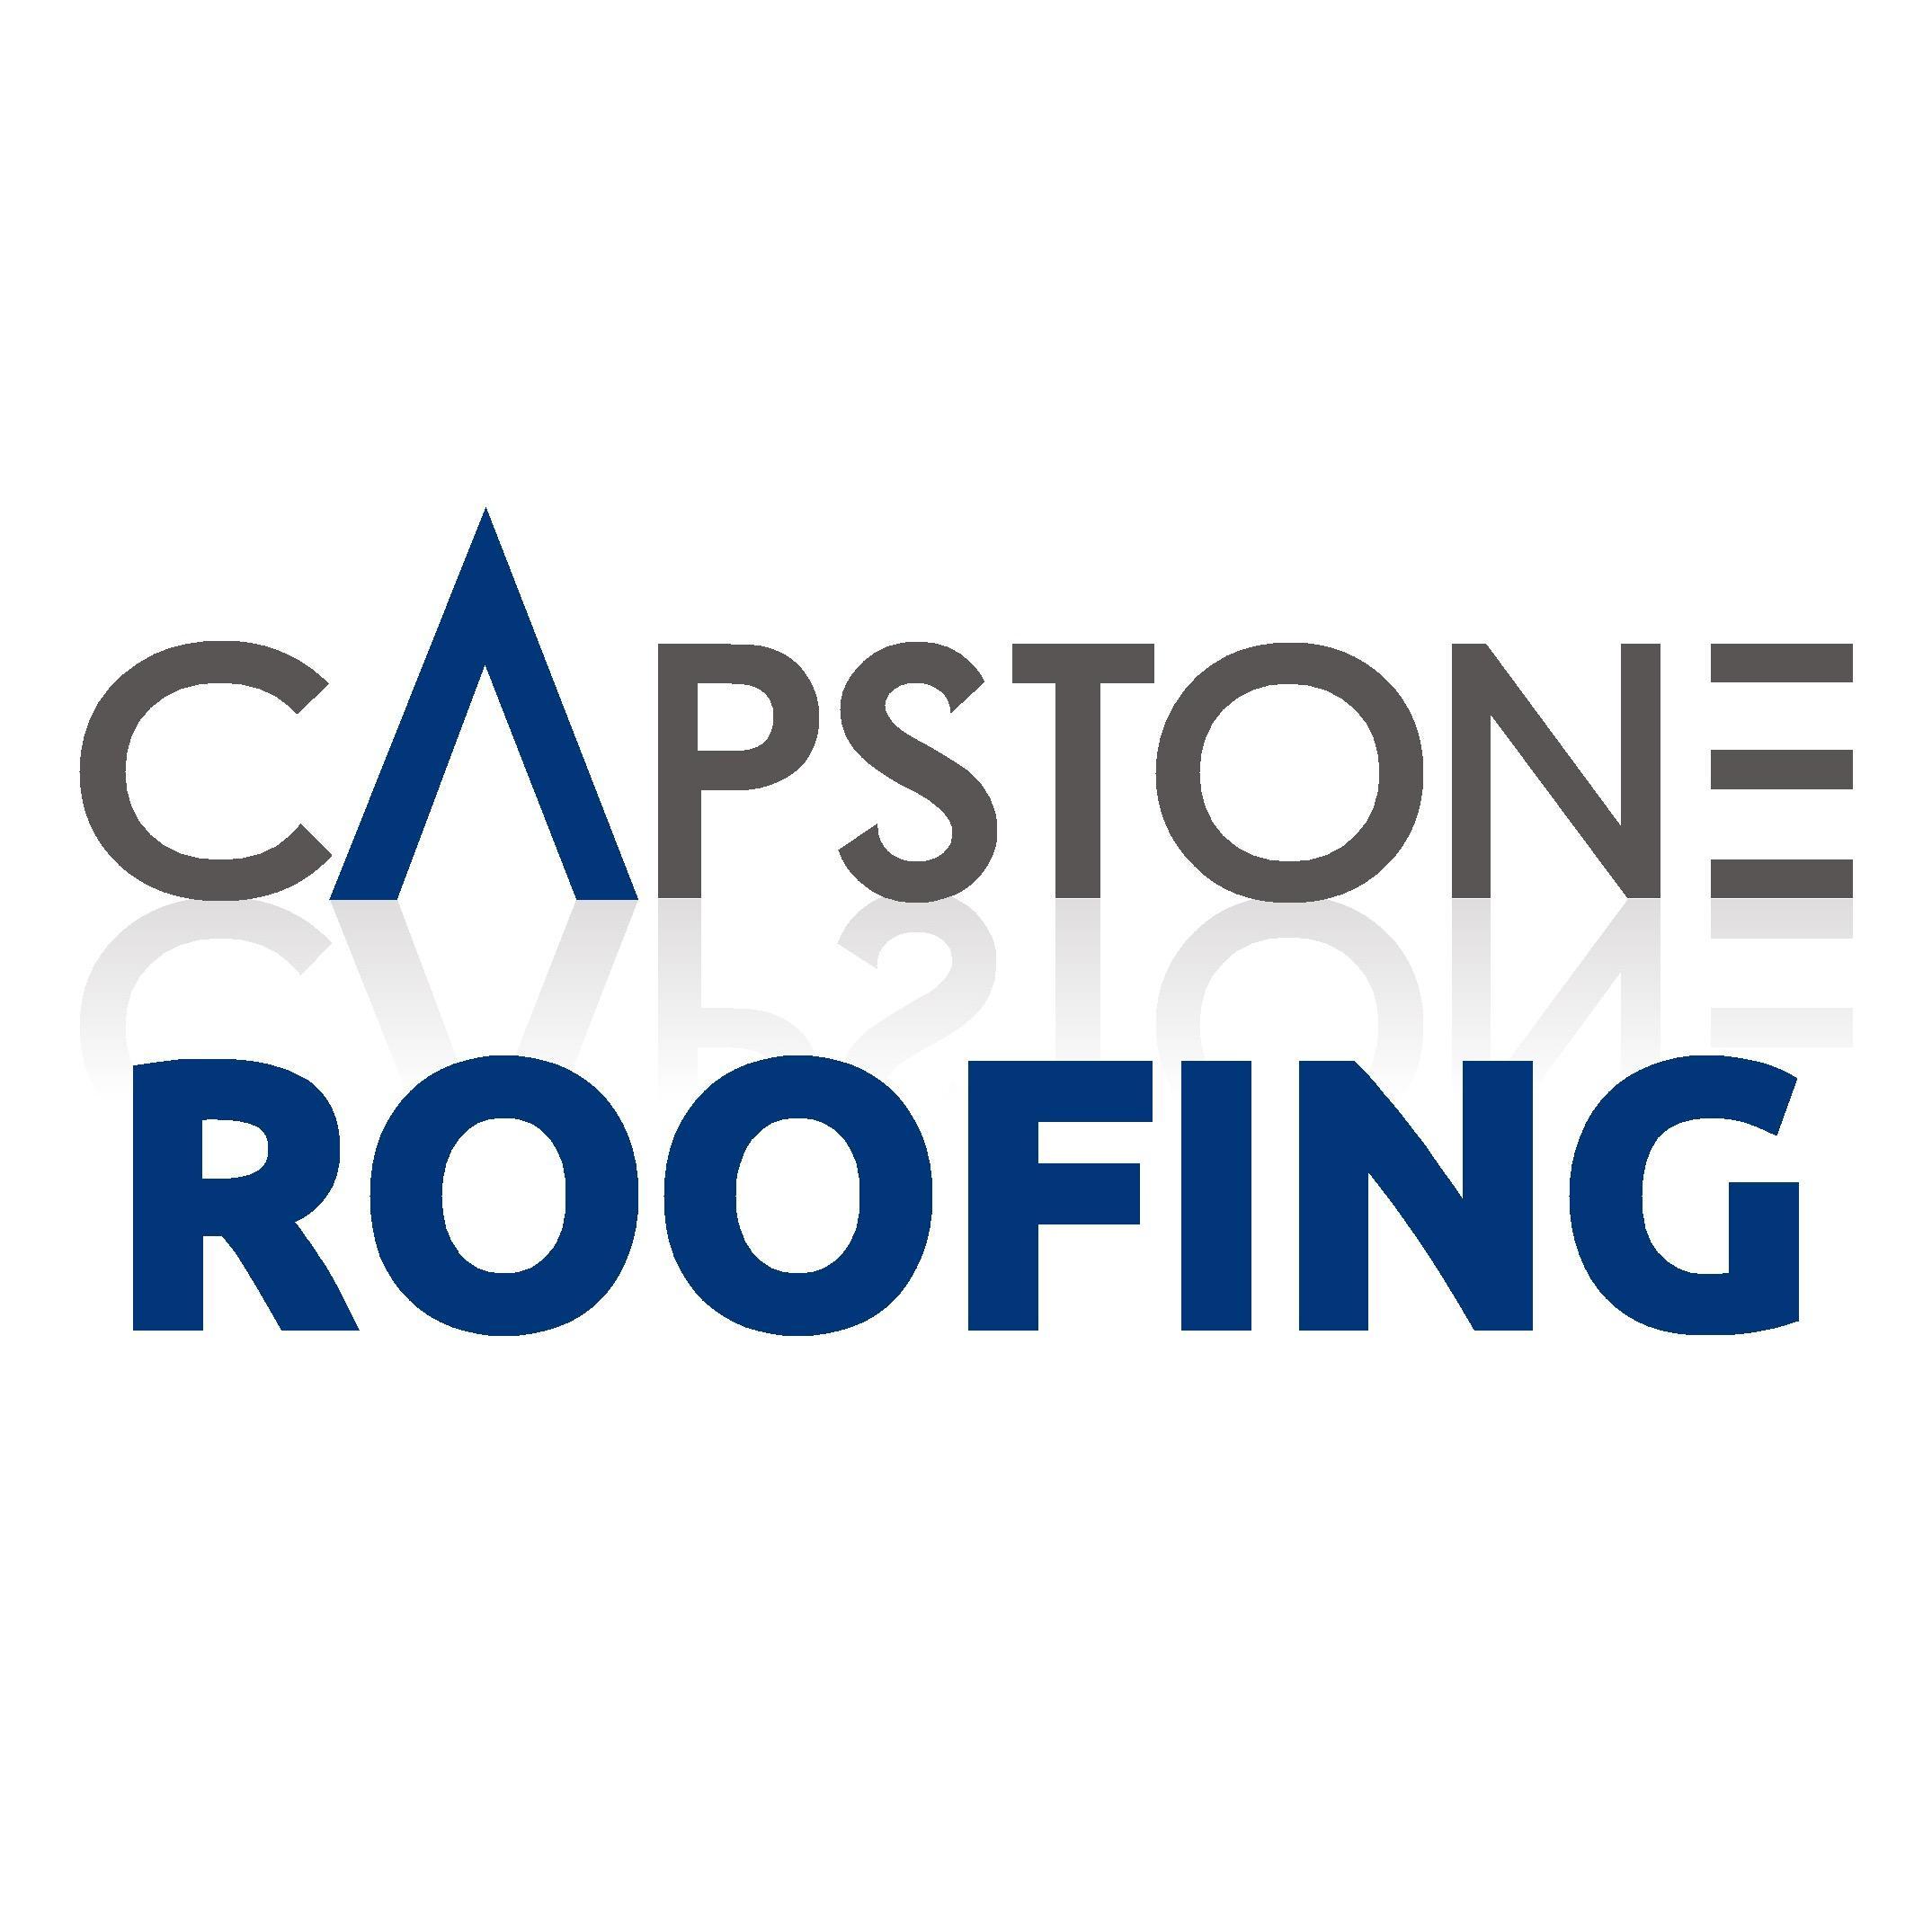 Capstone Roofing, LLC